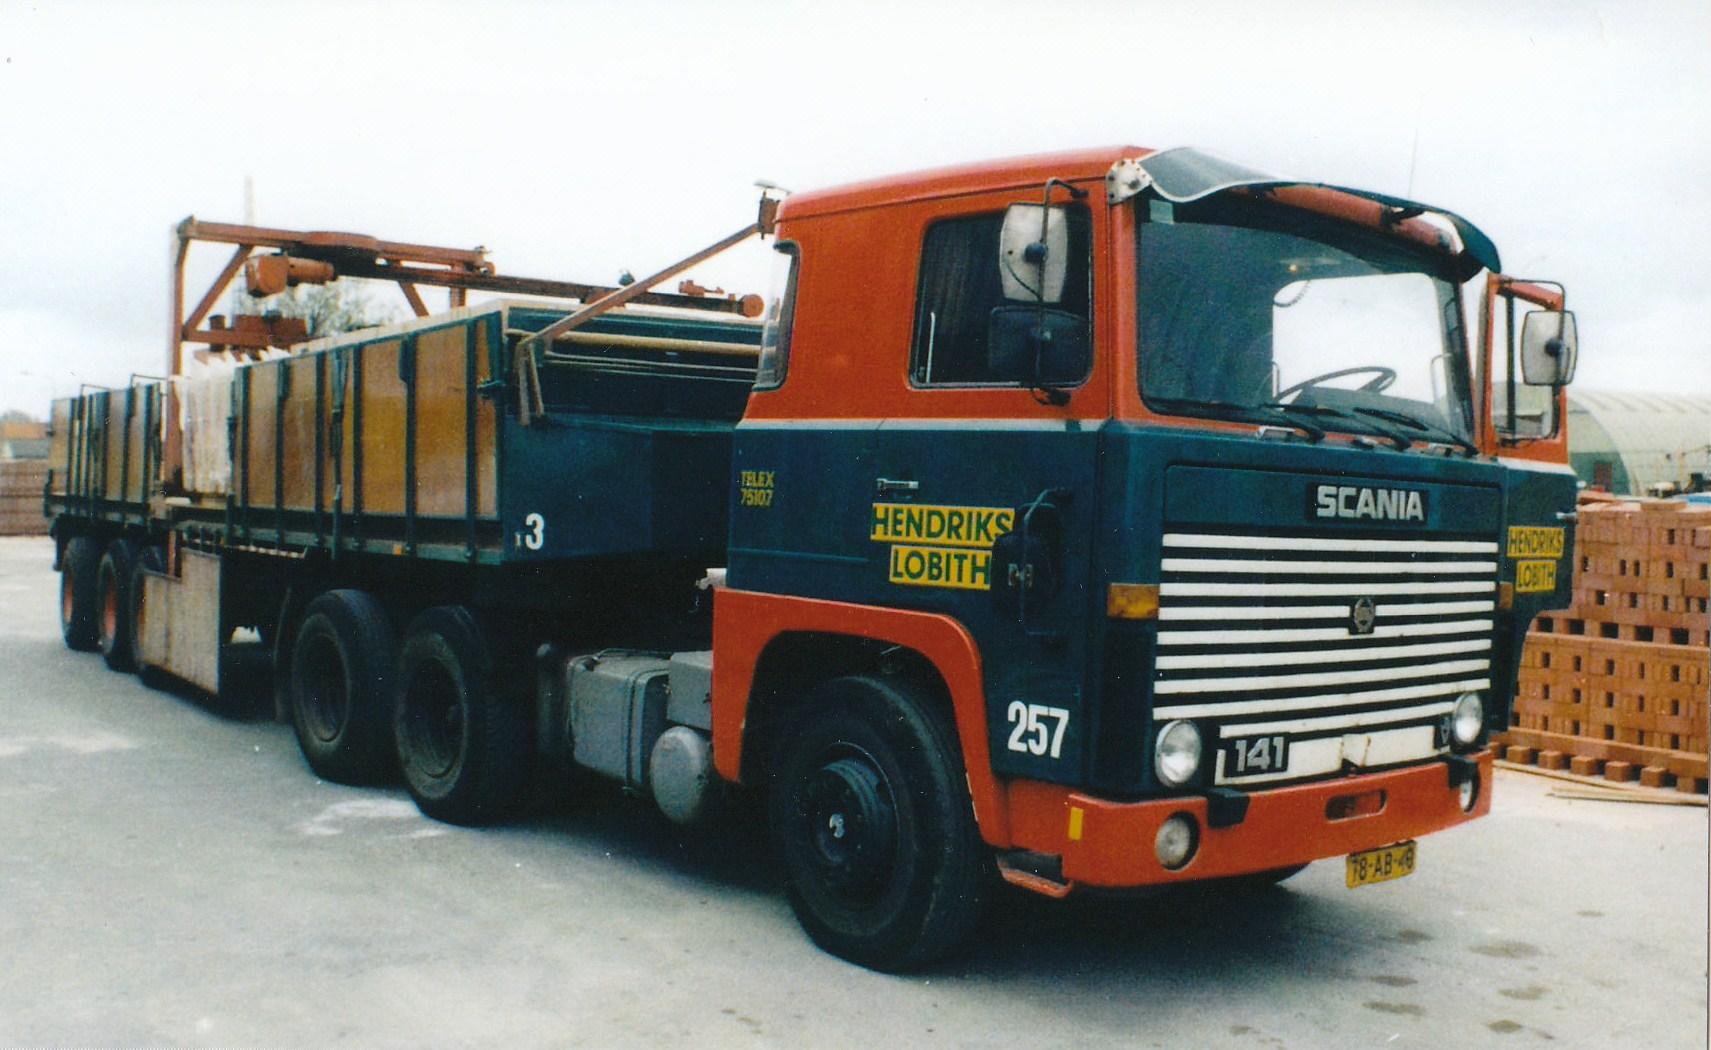 Hendriks-Lobith-Scania-LB141-78AB18